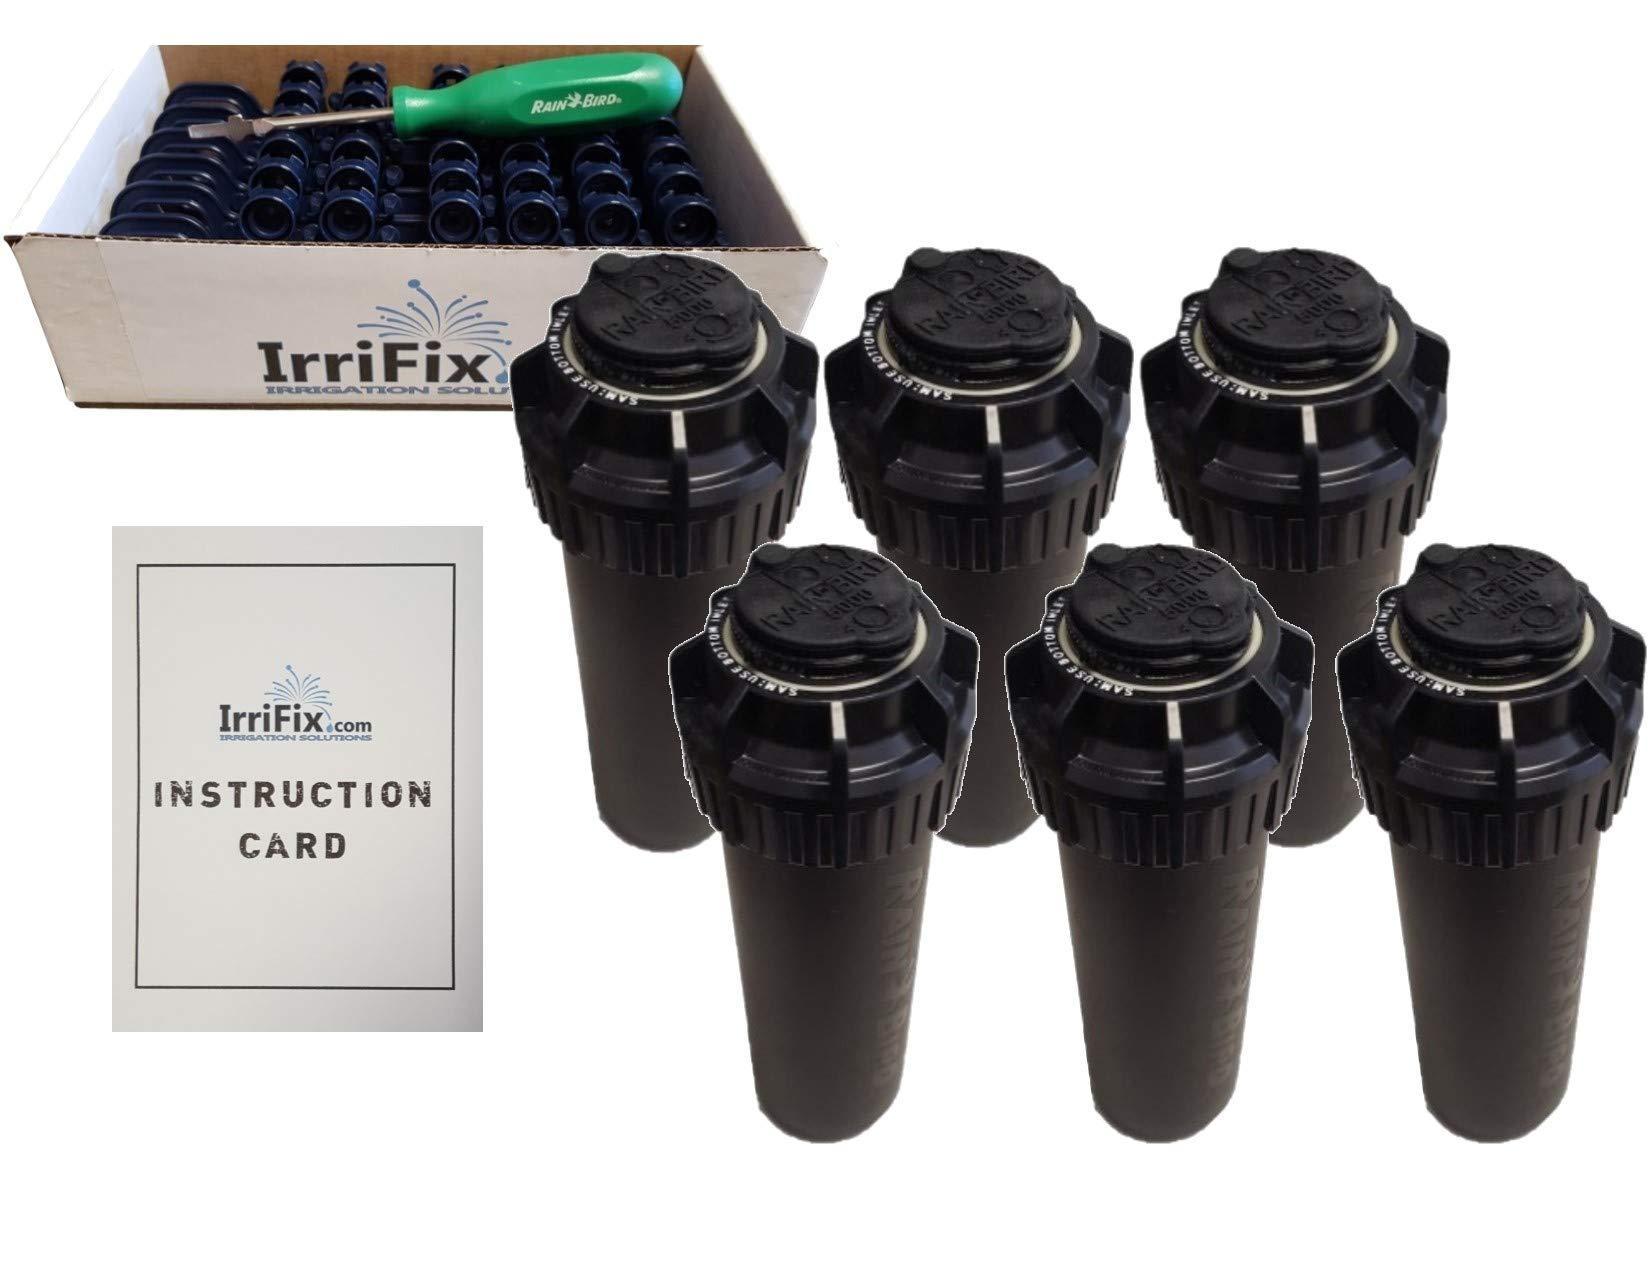 Rain Bird 5000 Series Seal-A-Matic Sprinkler Heads Bundle - 6 Pack 5004PCSAM SAM Rotors with IrriFix Nozzle Box Including 6 Nozzle Trees, 1 Rotortool Screwdriver, and IrriFix Instruction Sheet by IrriFix